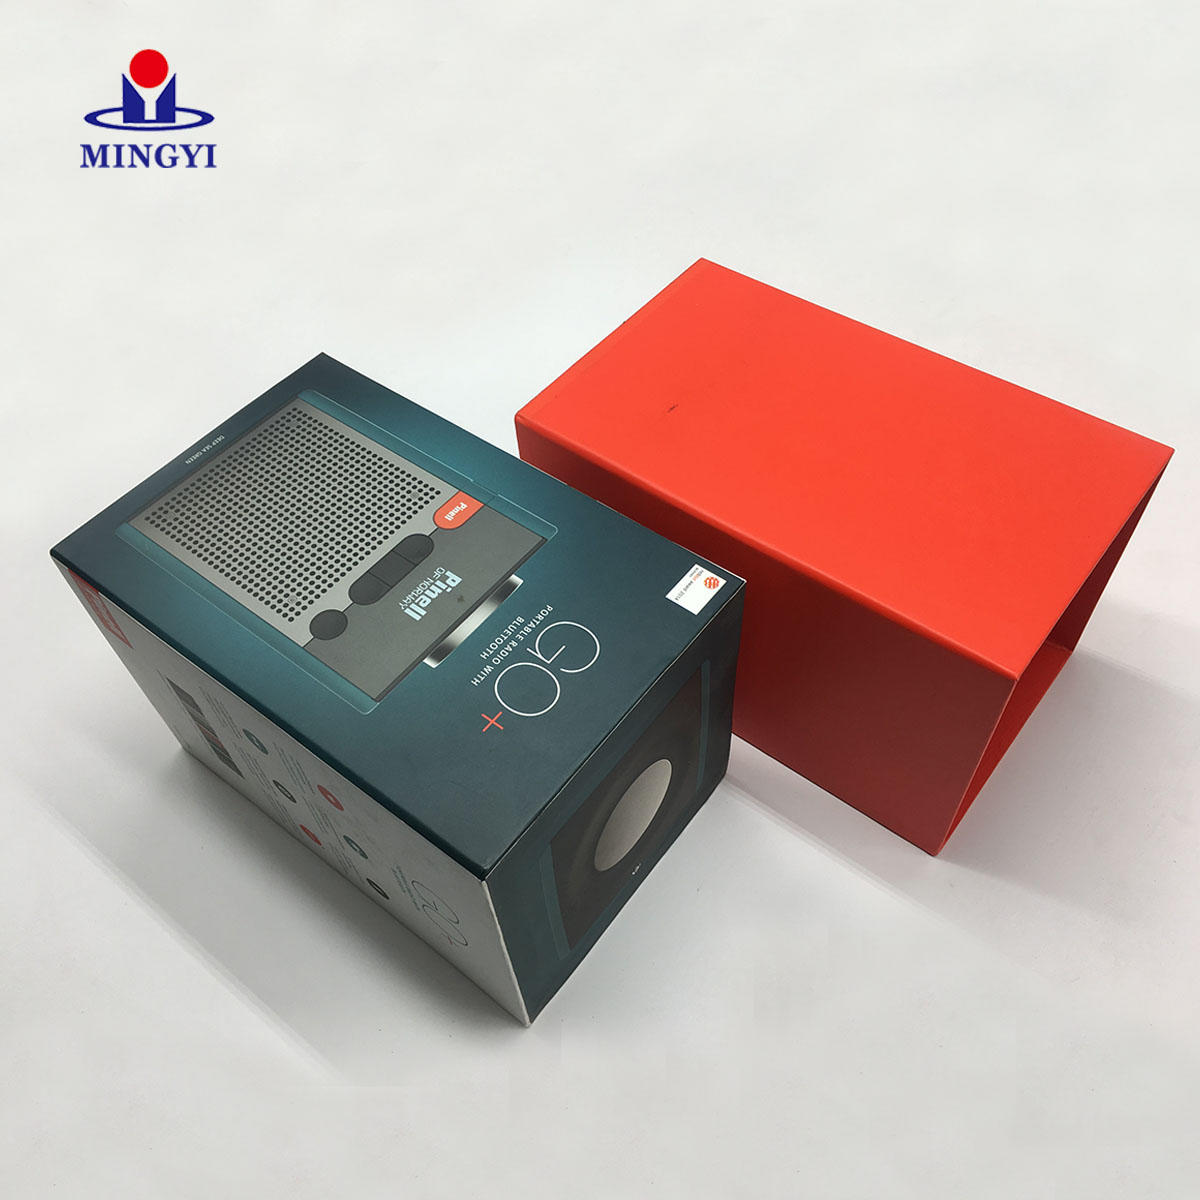 window ceremony eva design watch gift box Mingyi Printing